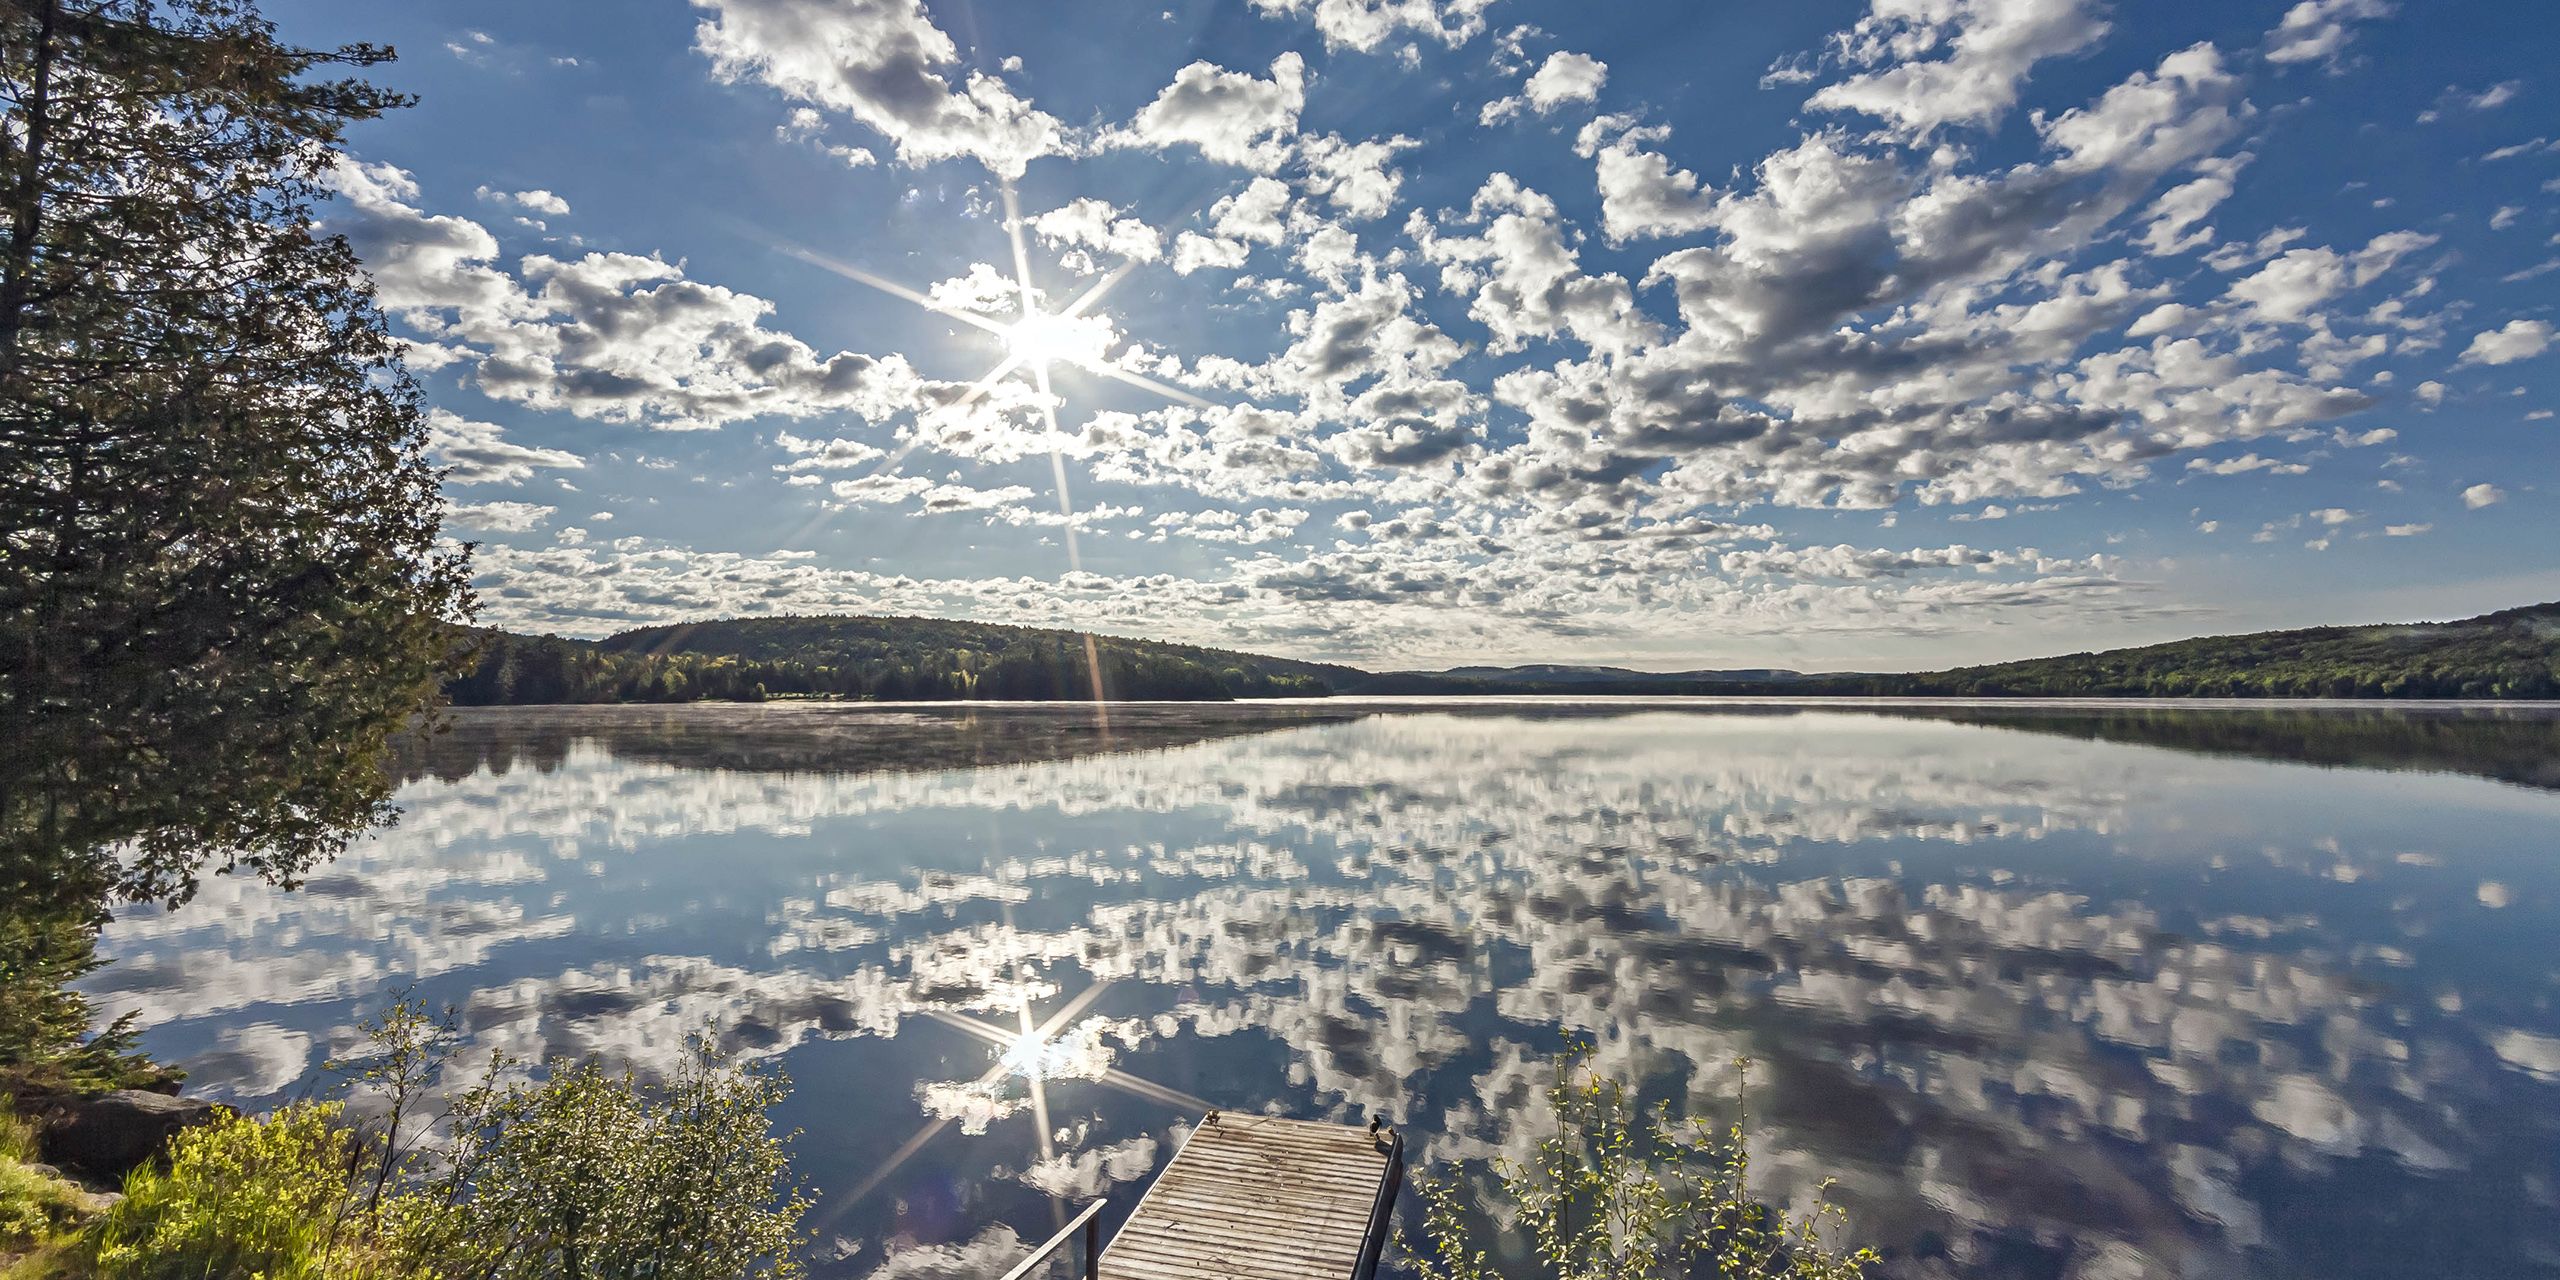 sunrise reflection over lake killarney lodge resort